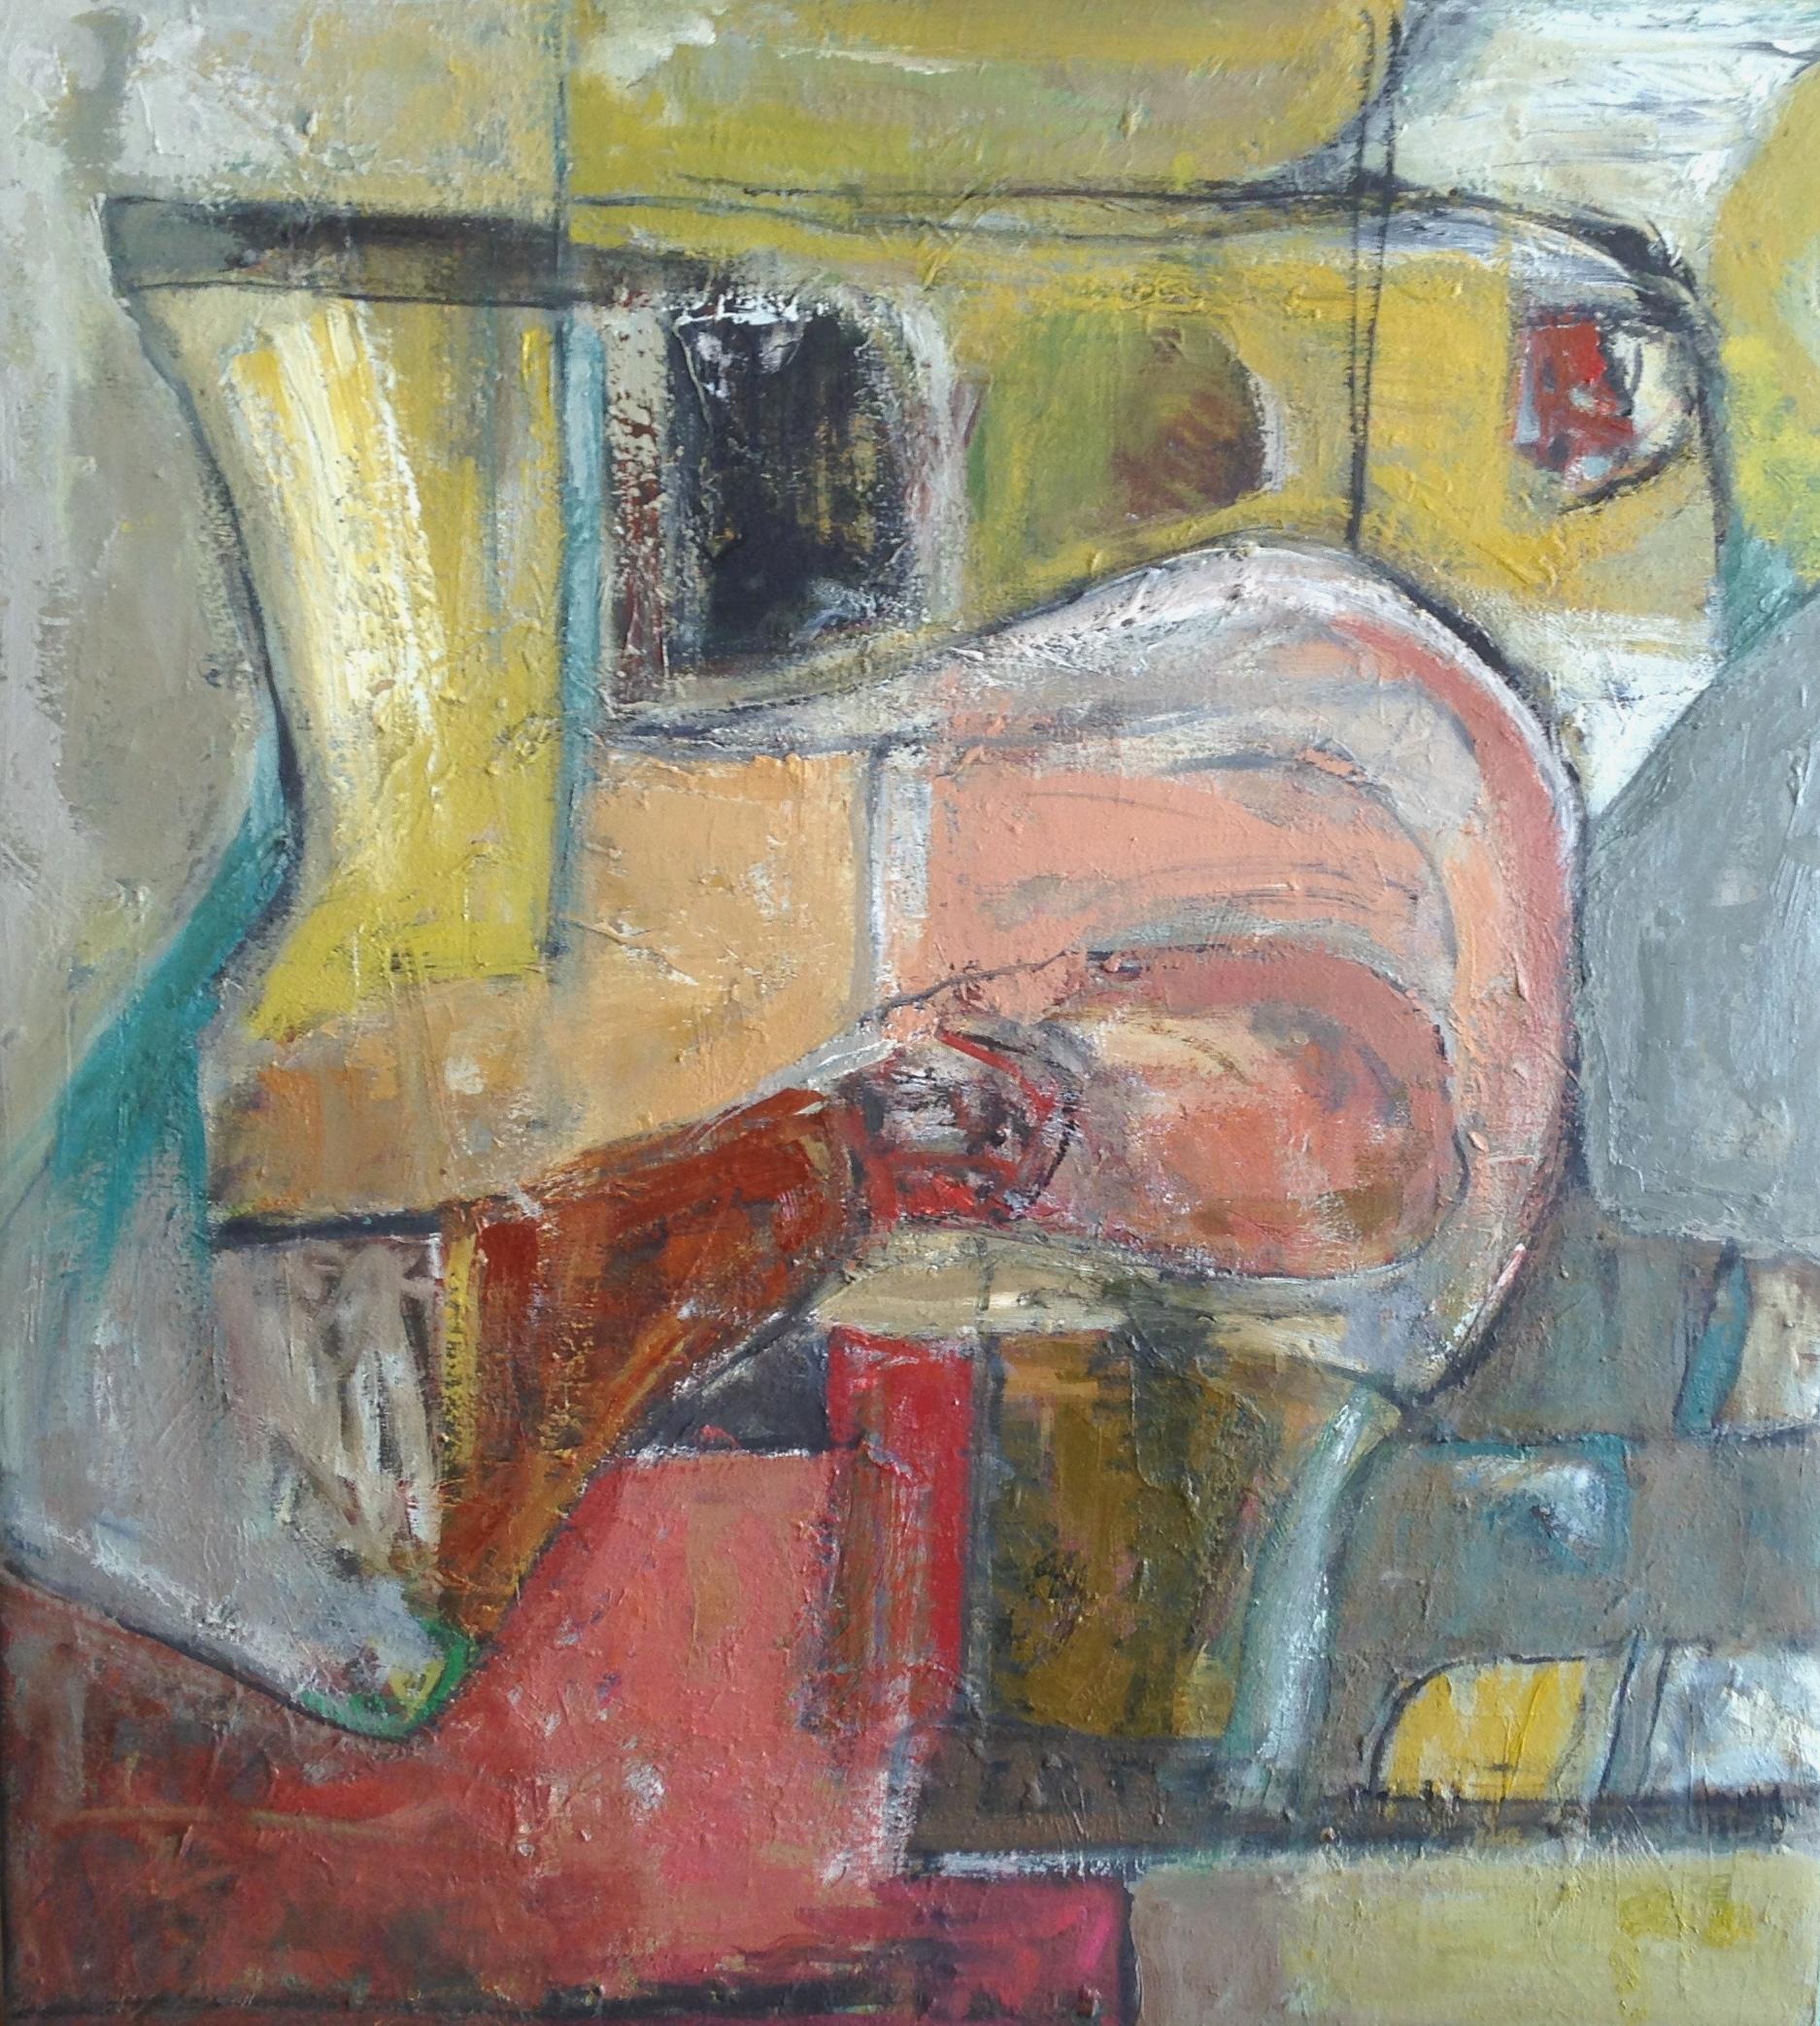 Ritual - Oil on canvas 76x69cm